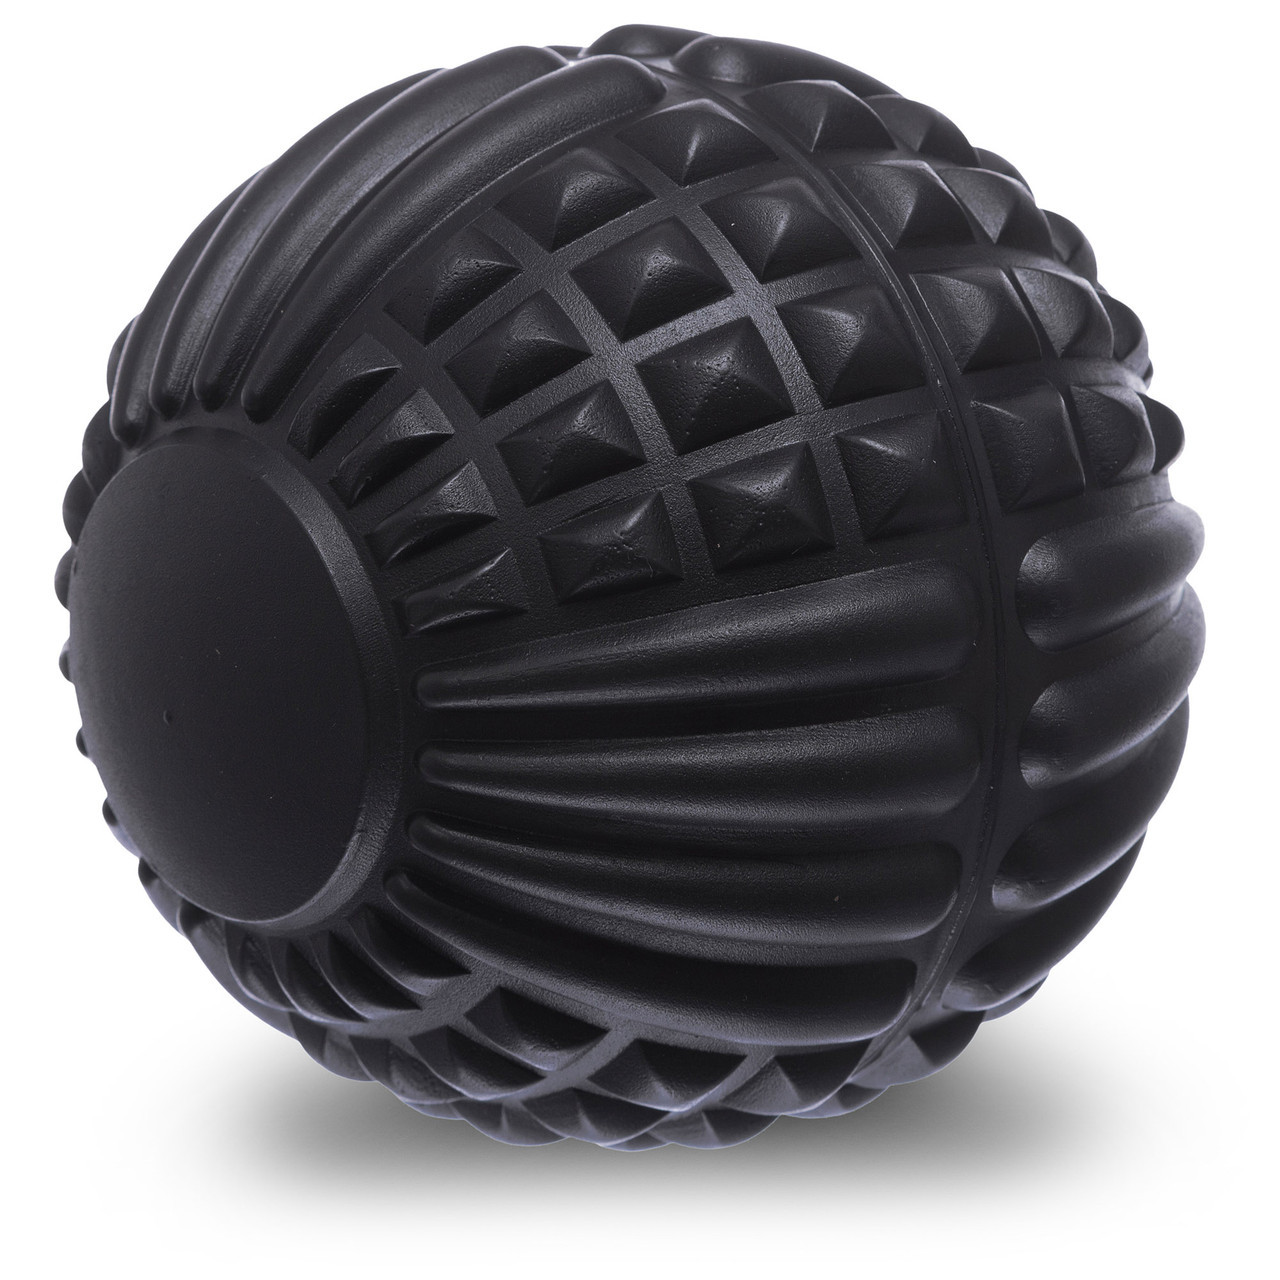 Массажер для спины Ball Rad Roller FI-1687 (TPR, диаметр 12см, цвета в ассортименте)